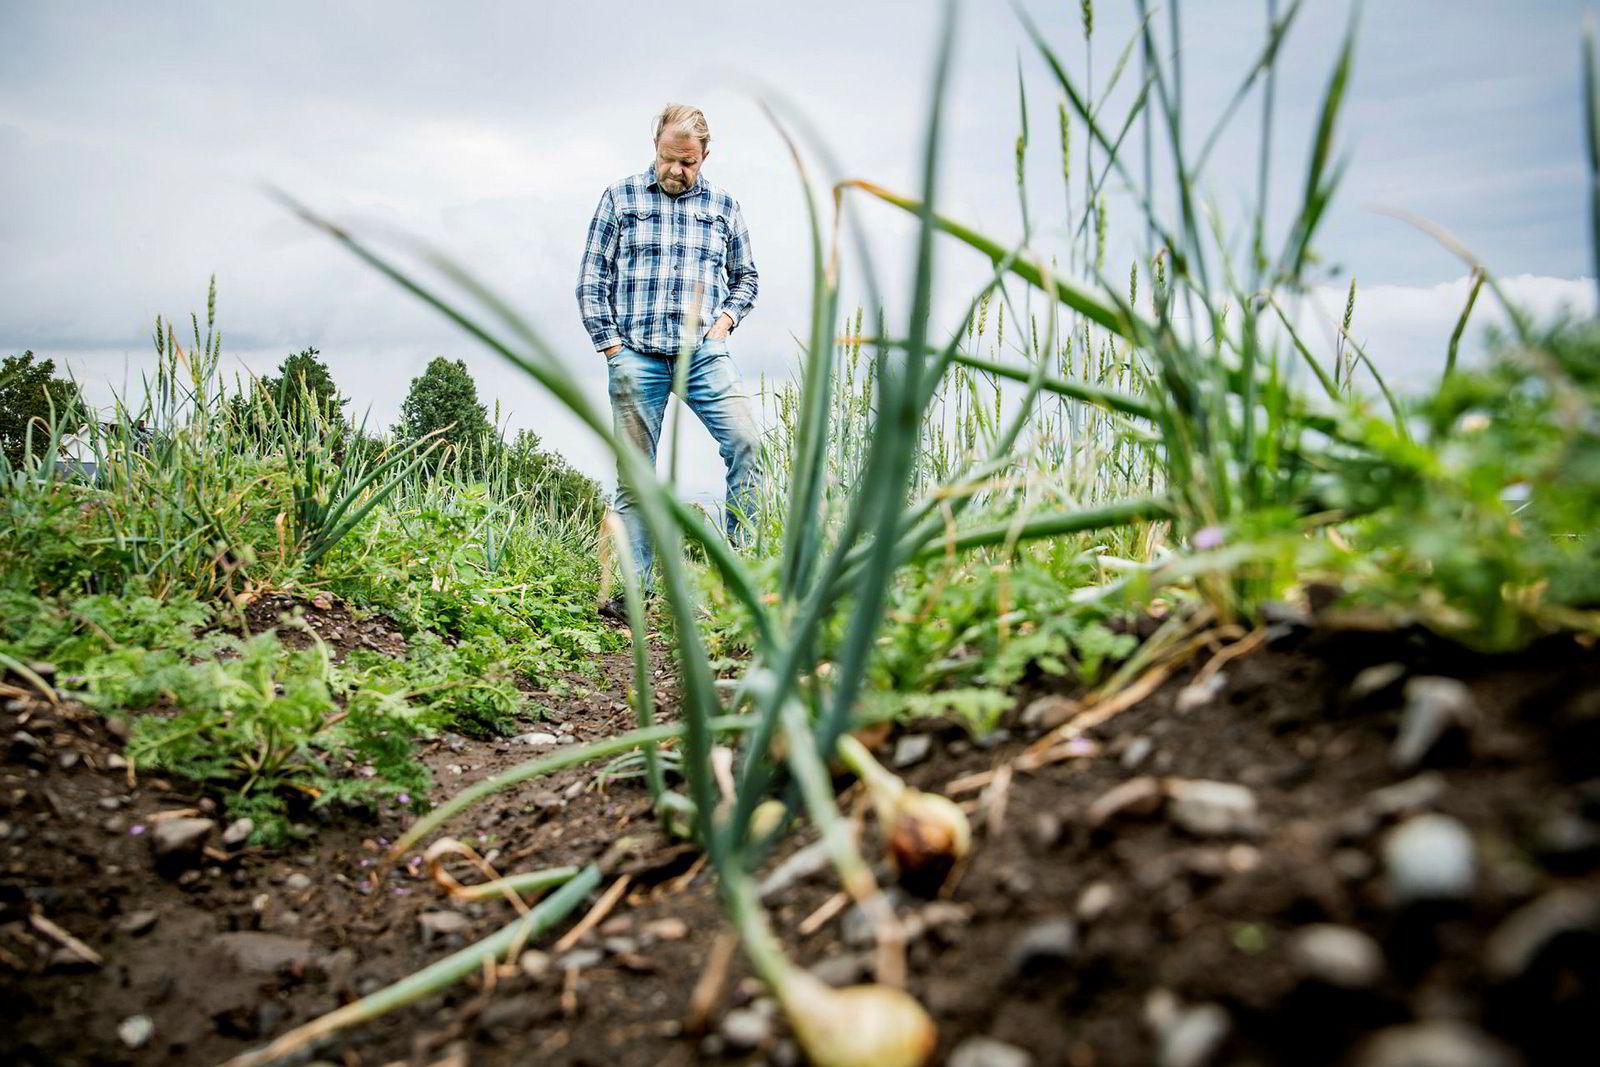 Grønnsaksbonde Odd Gjestvang regner med et tap på 2,5-3 millioner på løkavlingen. Løken tåler normalt ikke temperaturer over 27 grader.